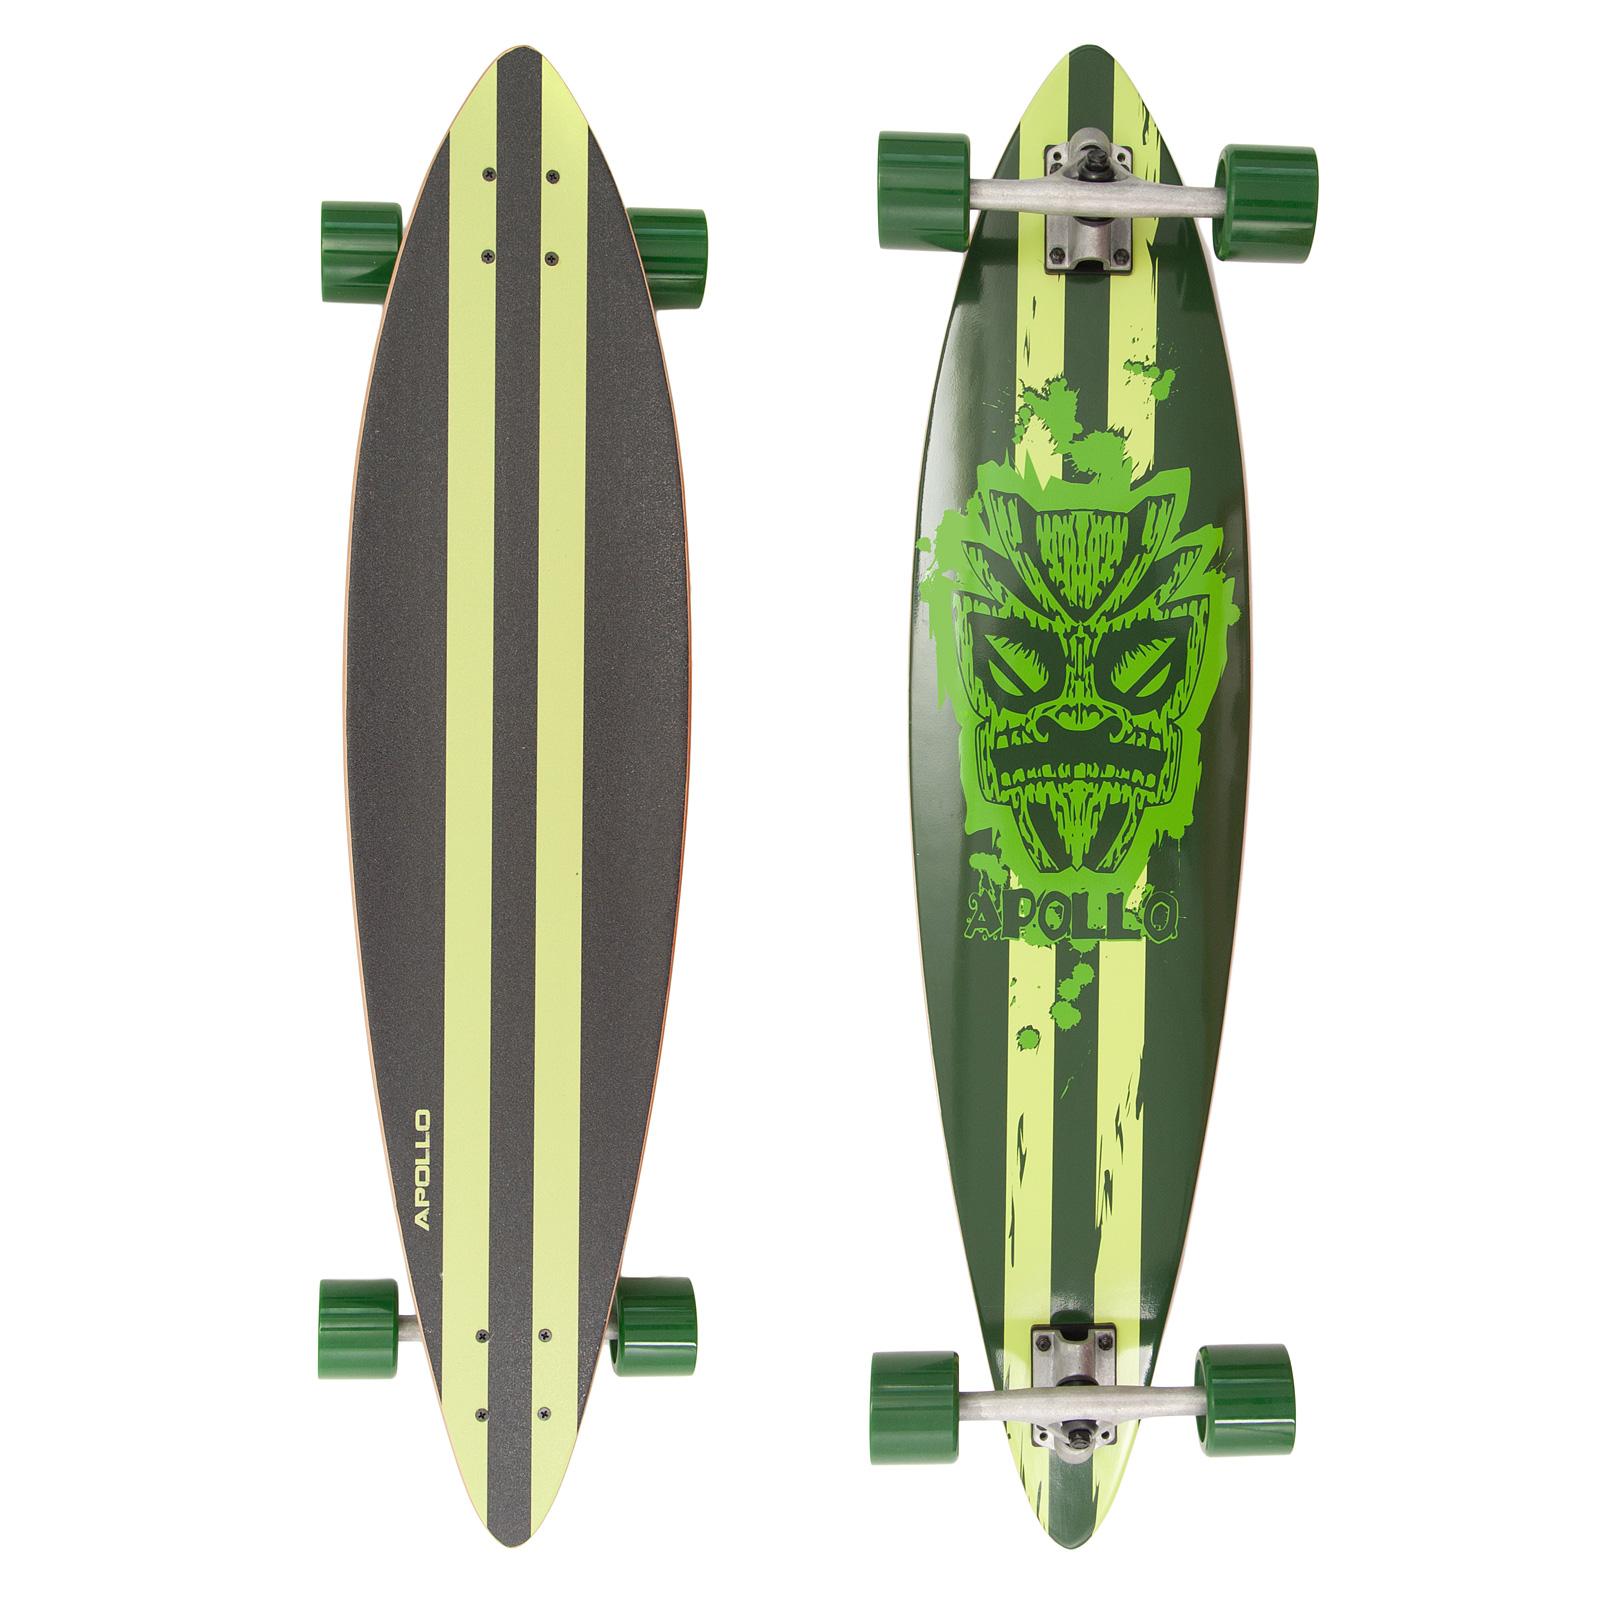 Apollo Totem Pintail Longboard, Komplettboard 39 (99cm)